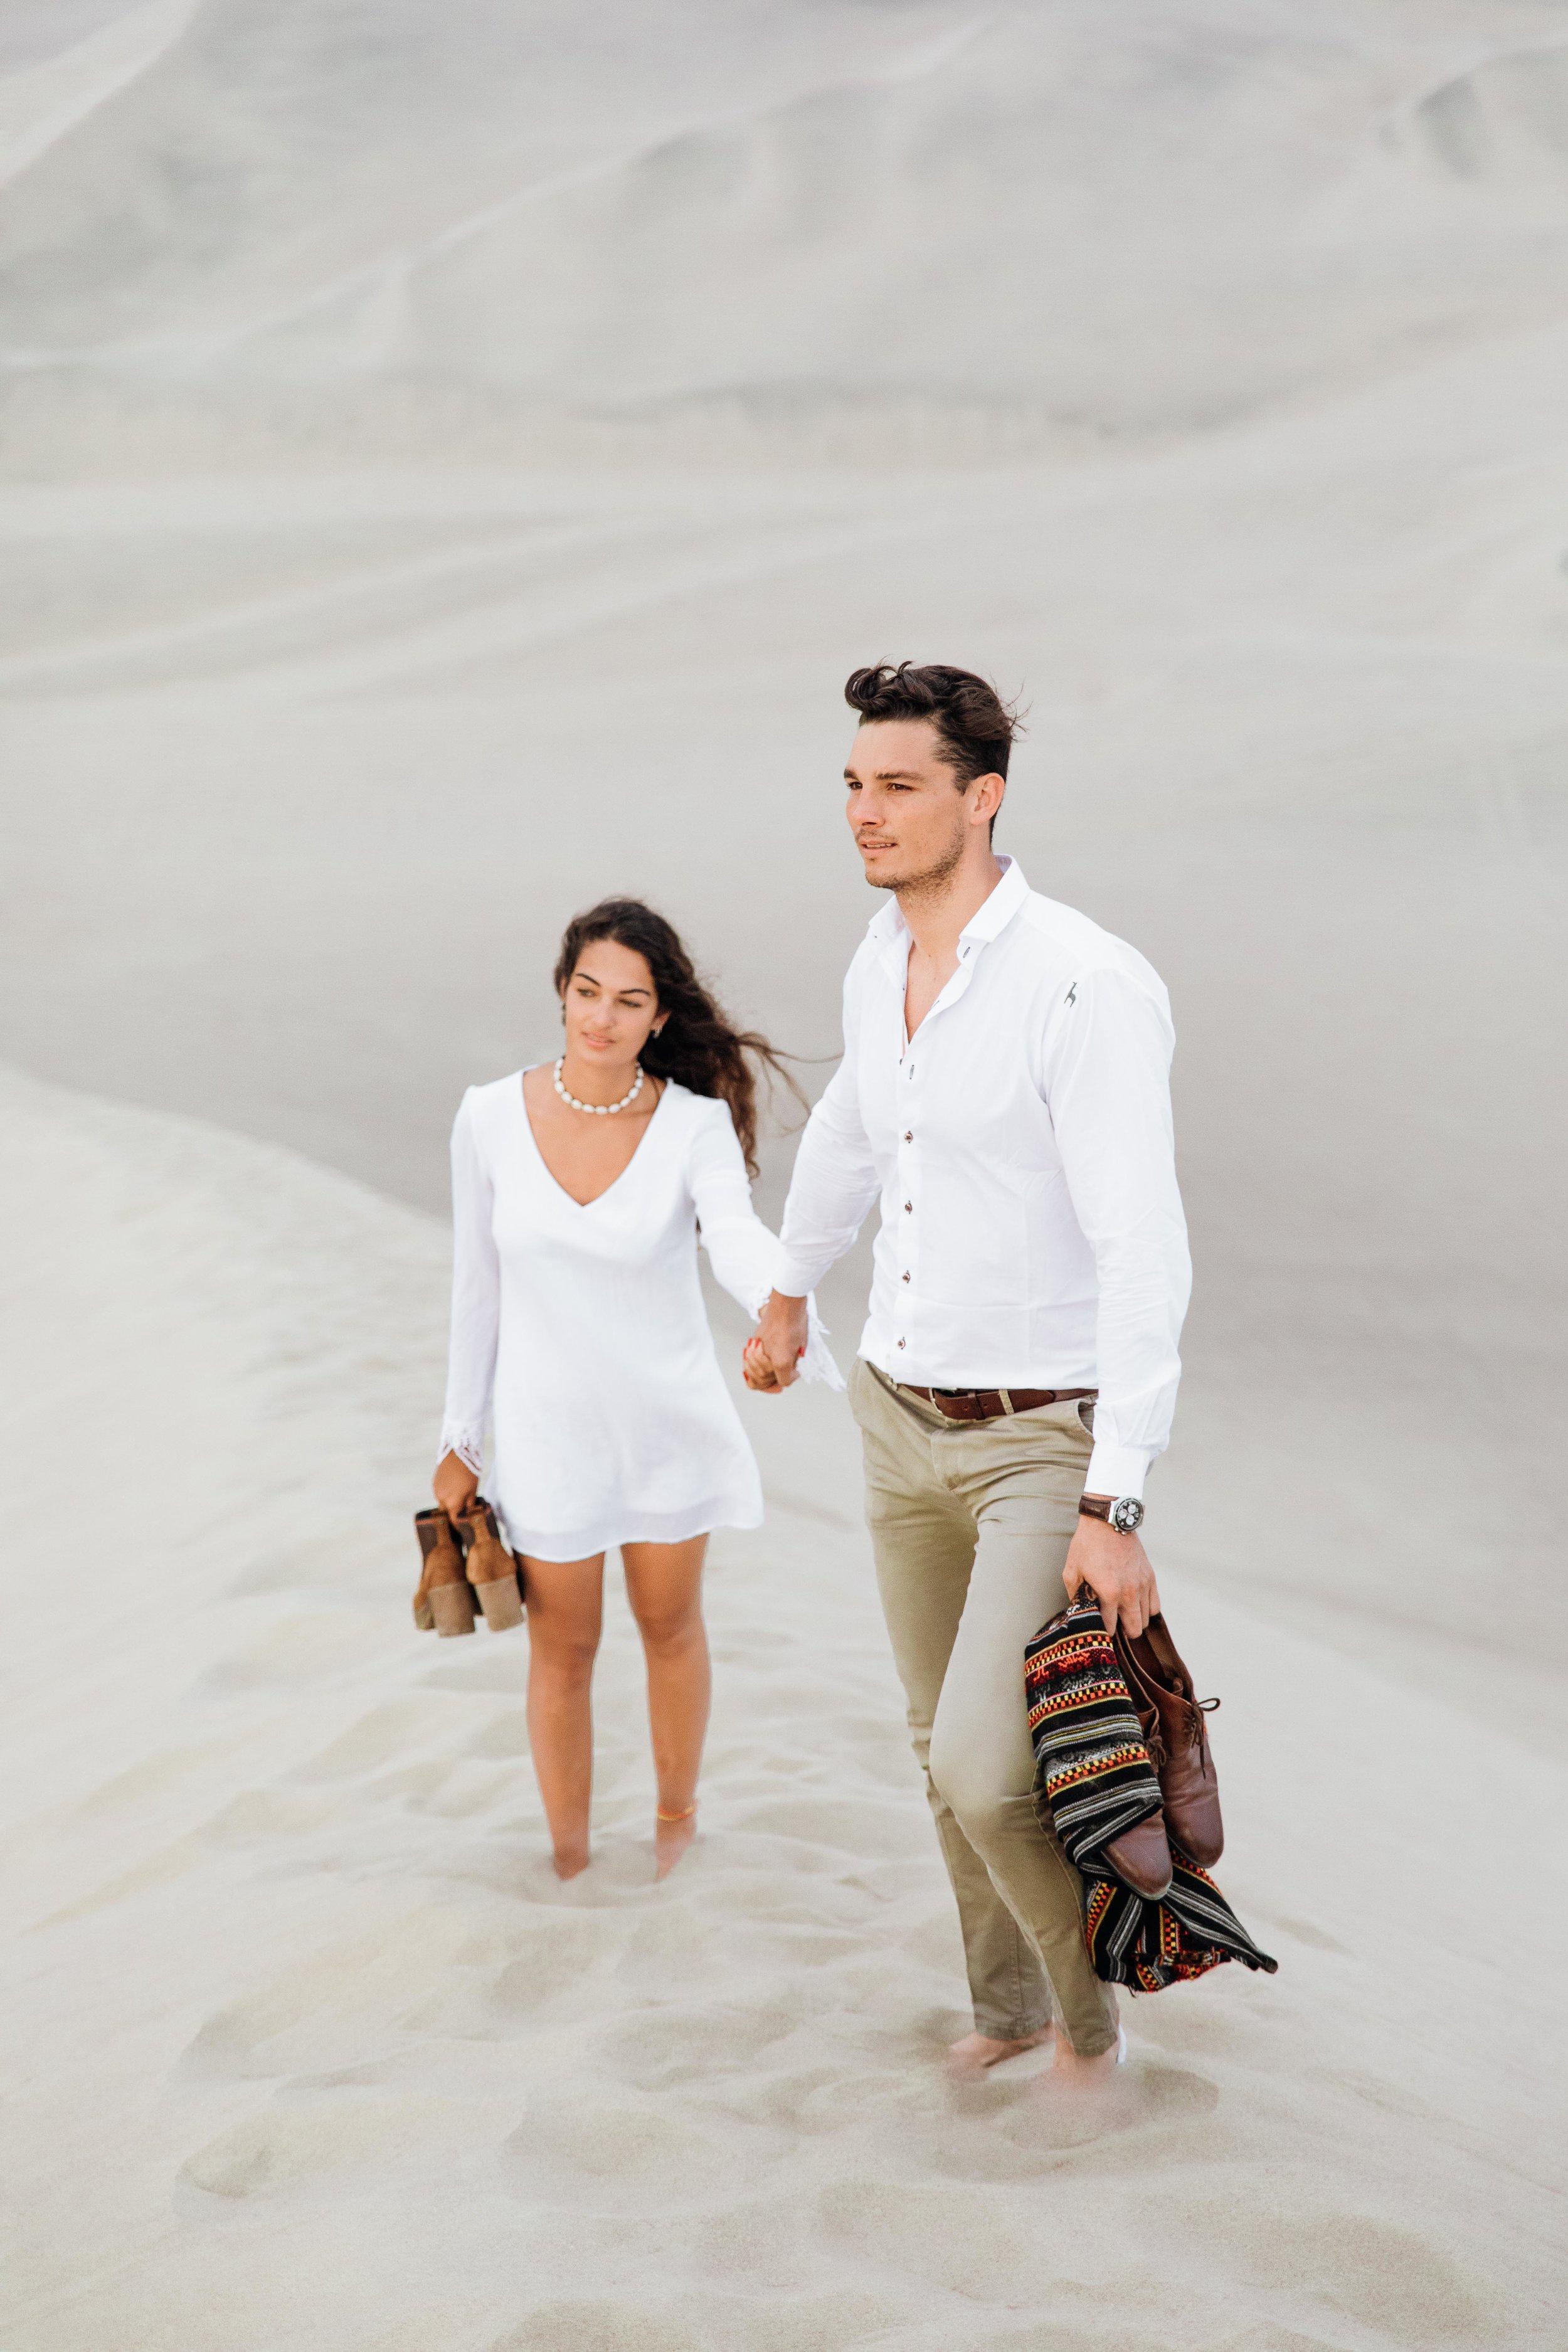 huacachina-peru-honeymoon-elopement-destination-wedding-photography-michael-cozzens-12.jpg